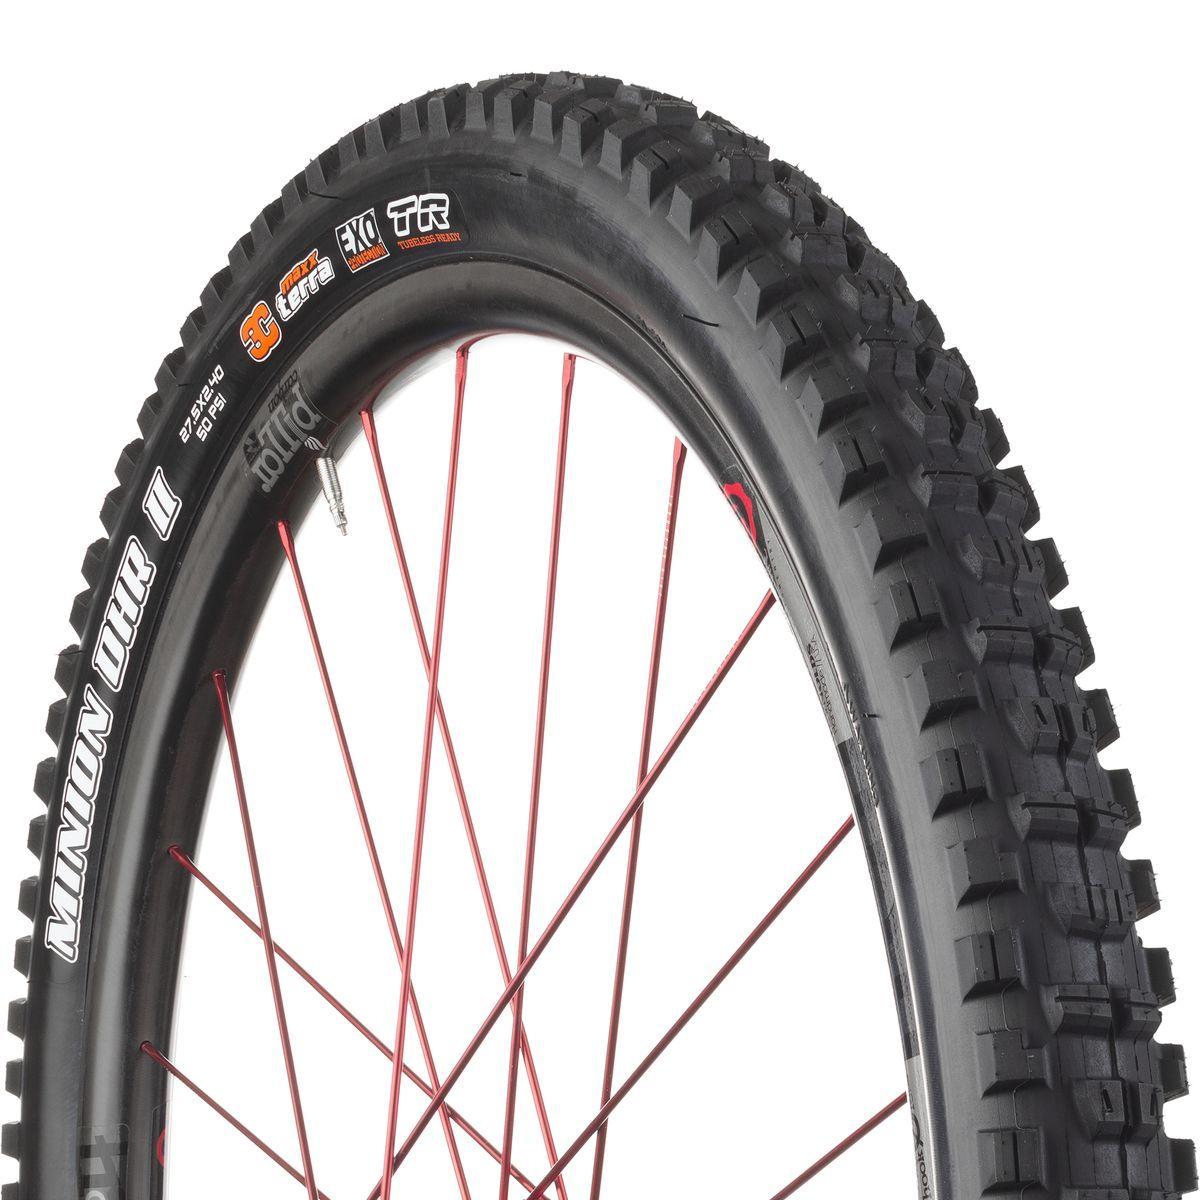 Maxxis Minion DHR II Wide Trail 3C/EXO/TR Tire - 27.5in